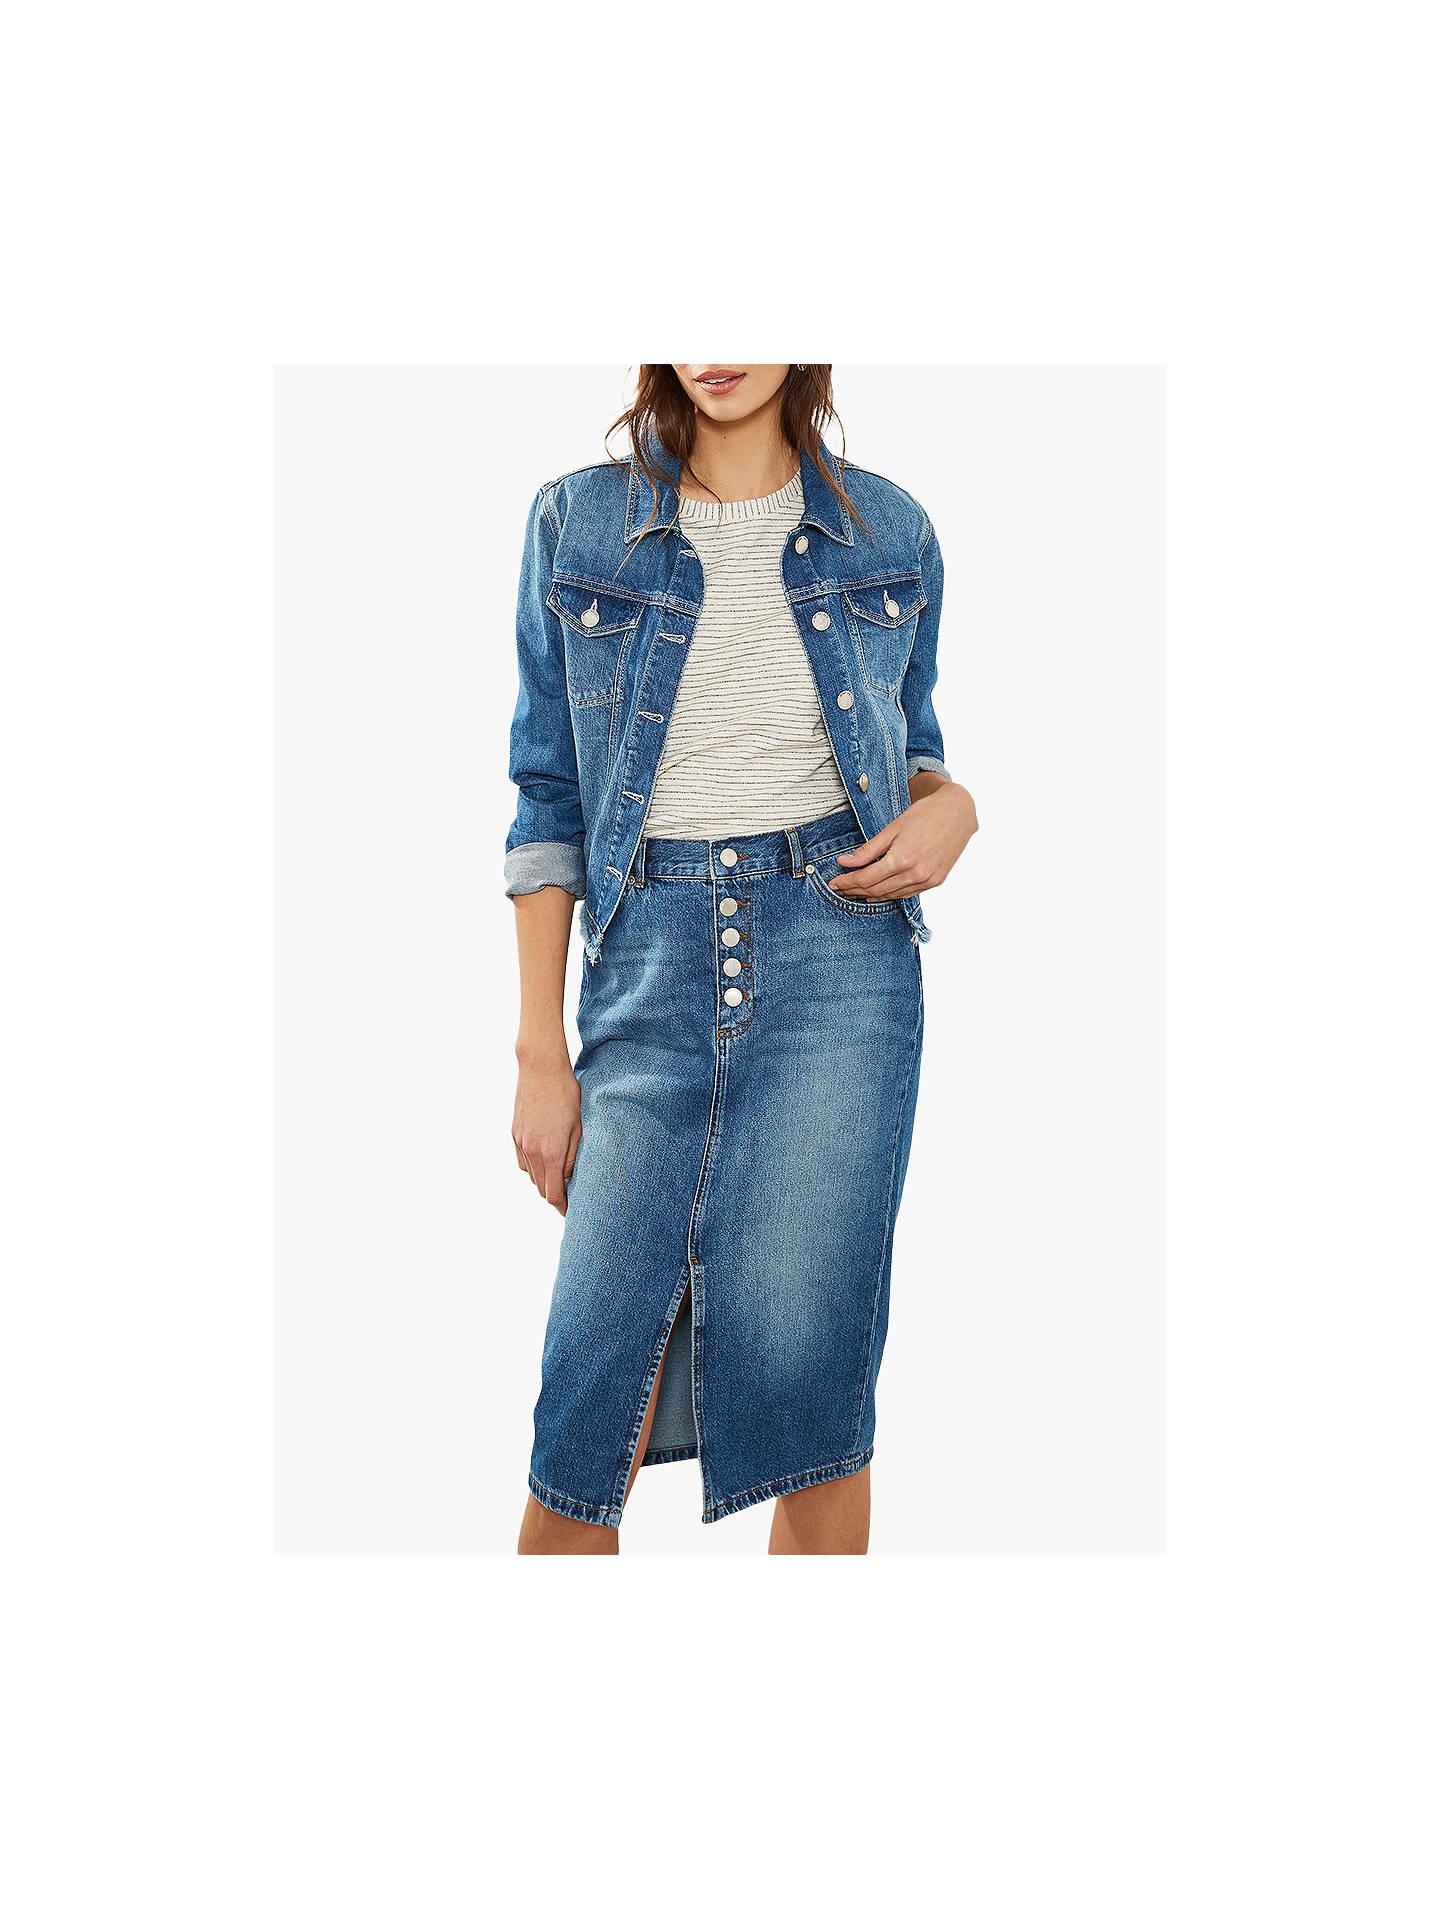 9d3cee192b221 Buy Mint Velvet Denim Jacket, Blue, 6 Online at johnlewis.com ...